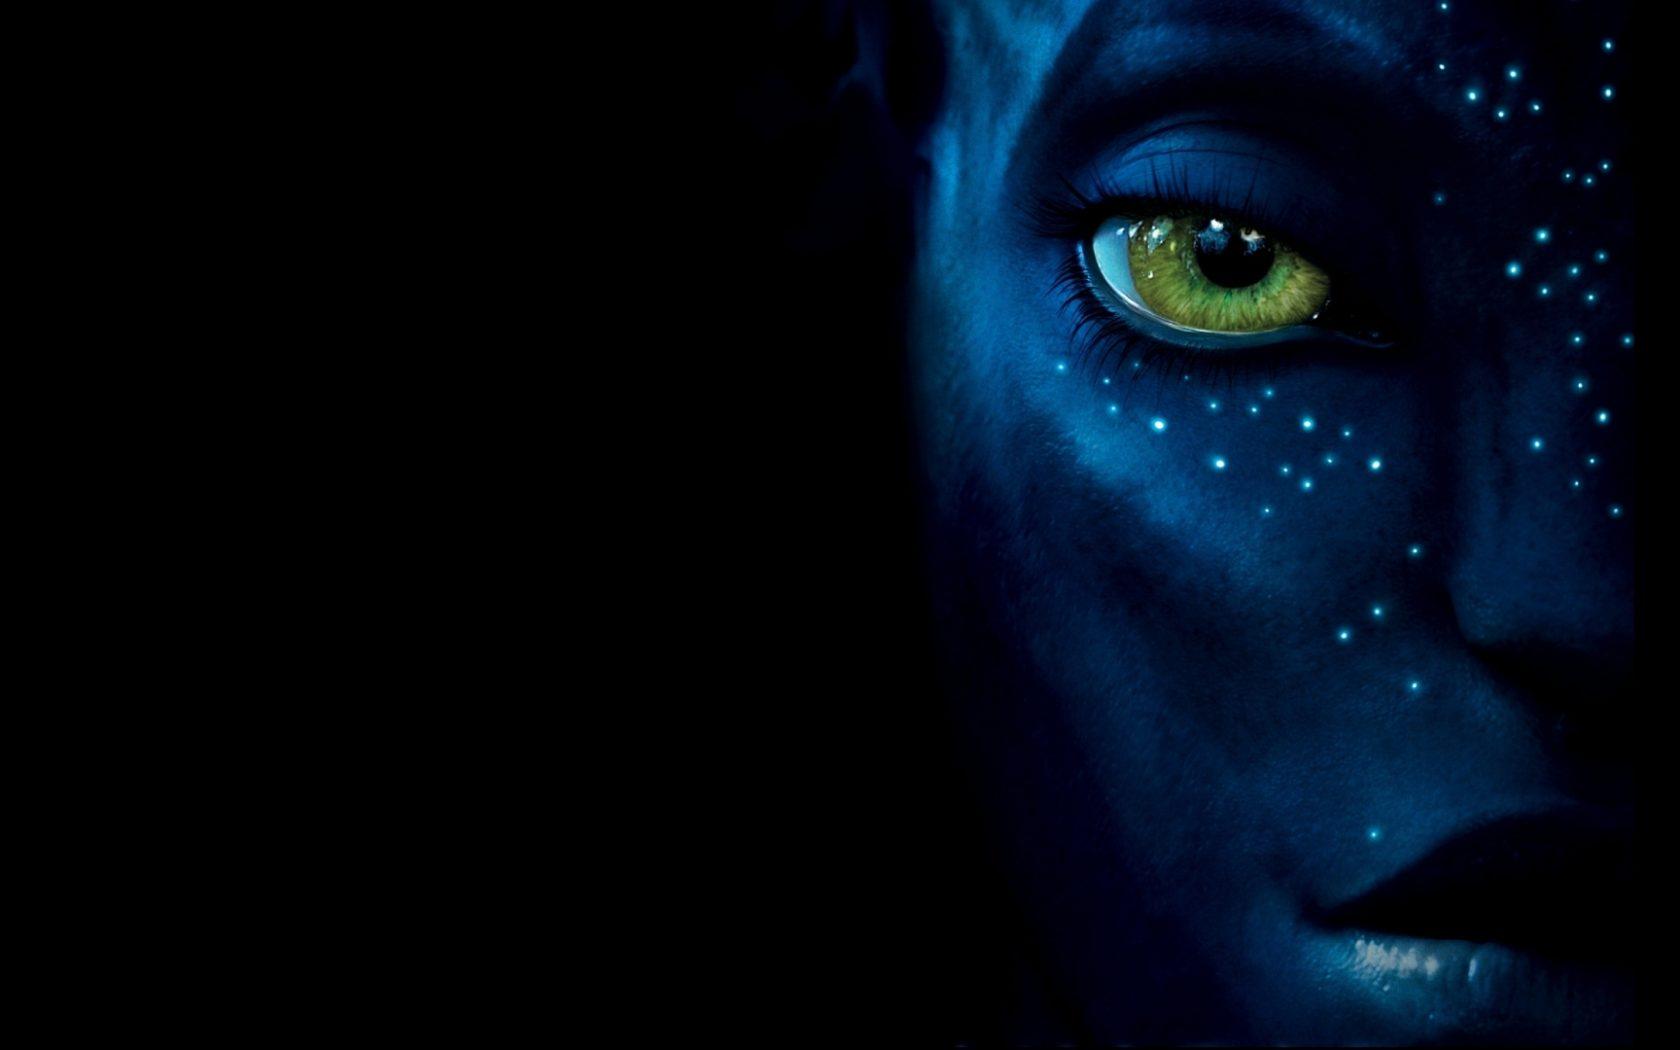 Avatar 2009 Hd Wallpaper